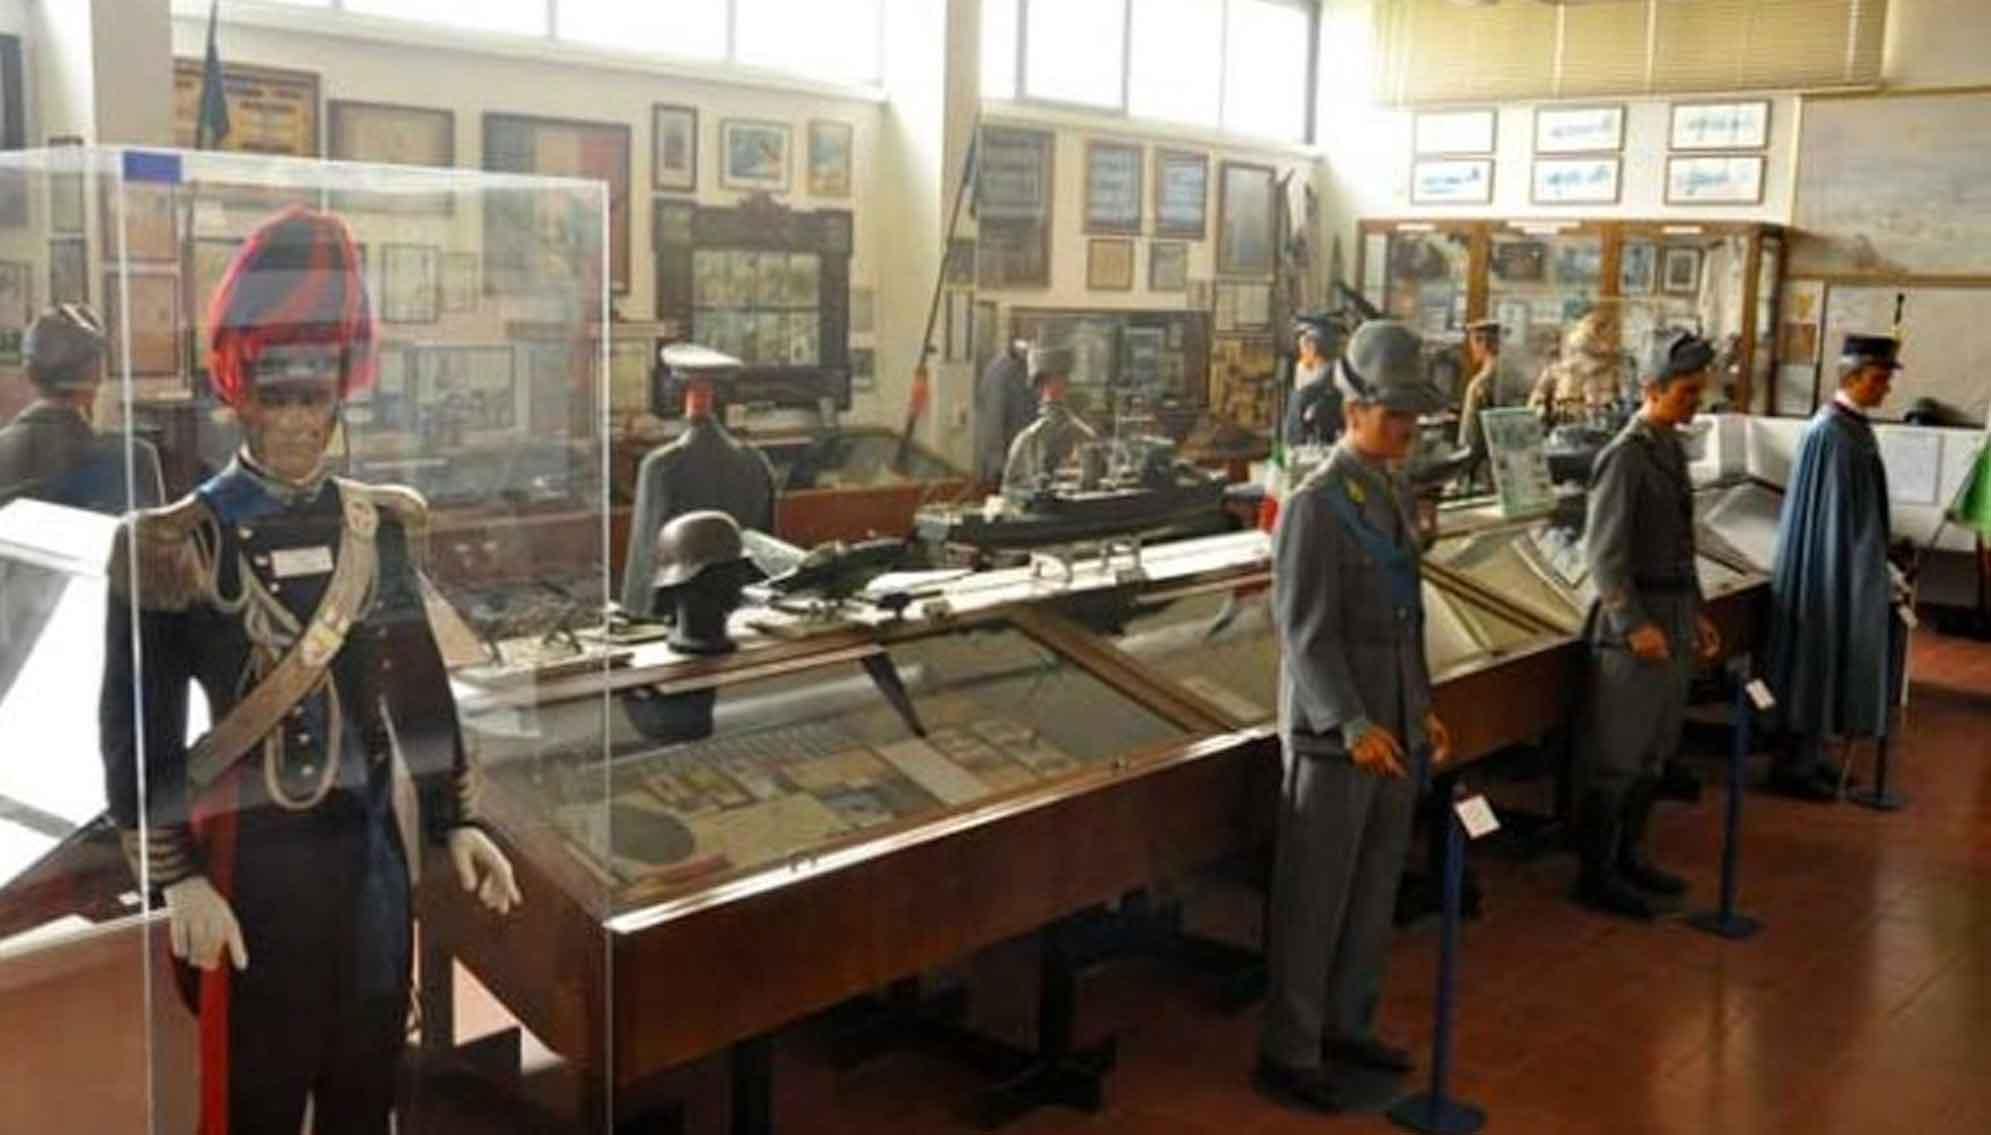 a-novara_1991x1135_museo-storico-novarese-aldo-rossini